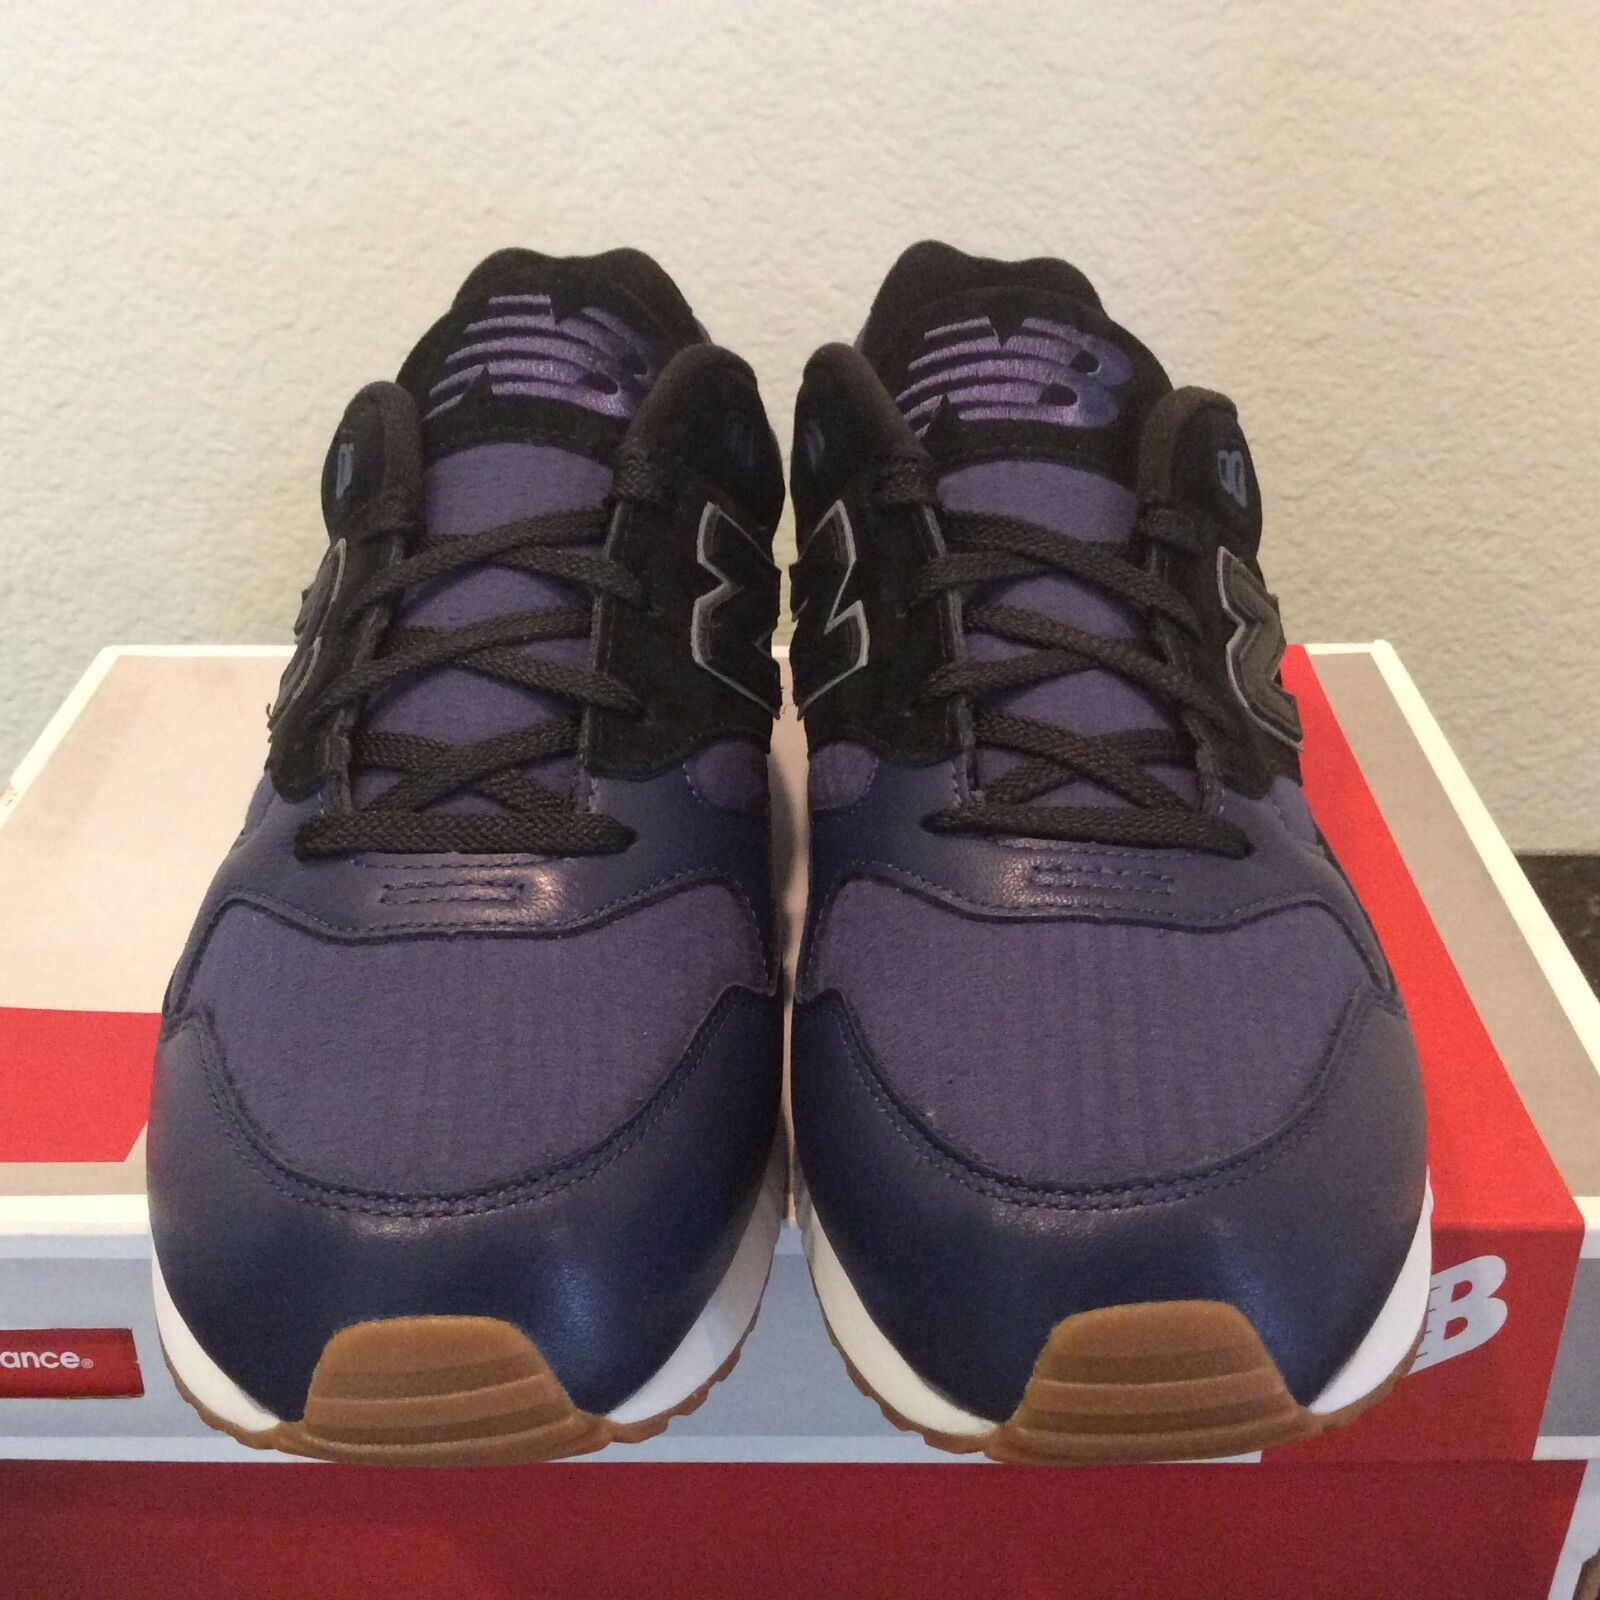 New Balance Men's M530NOB Athleisure Shoes